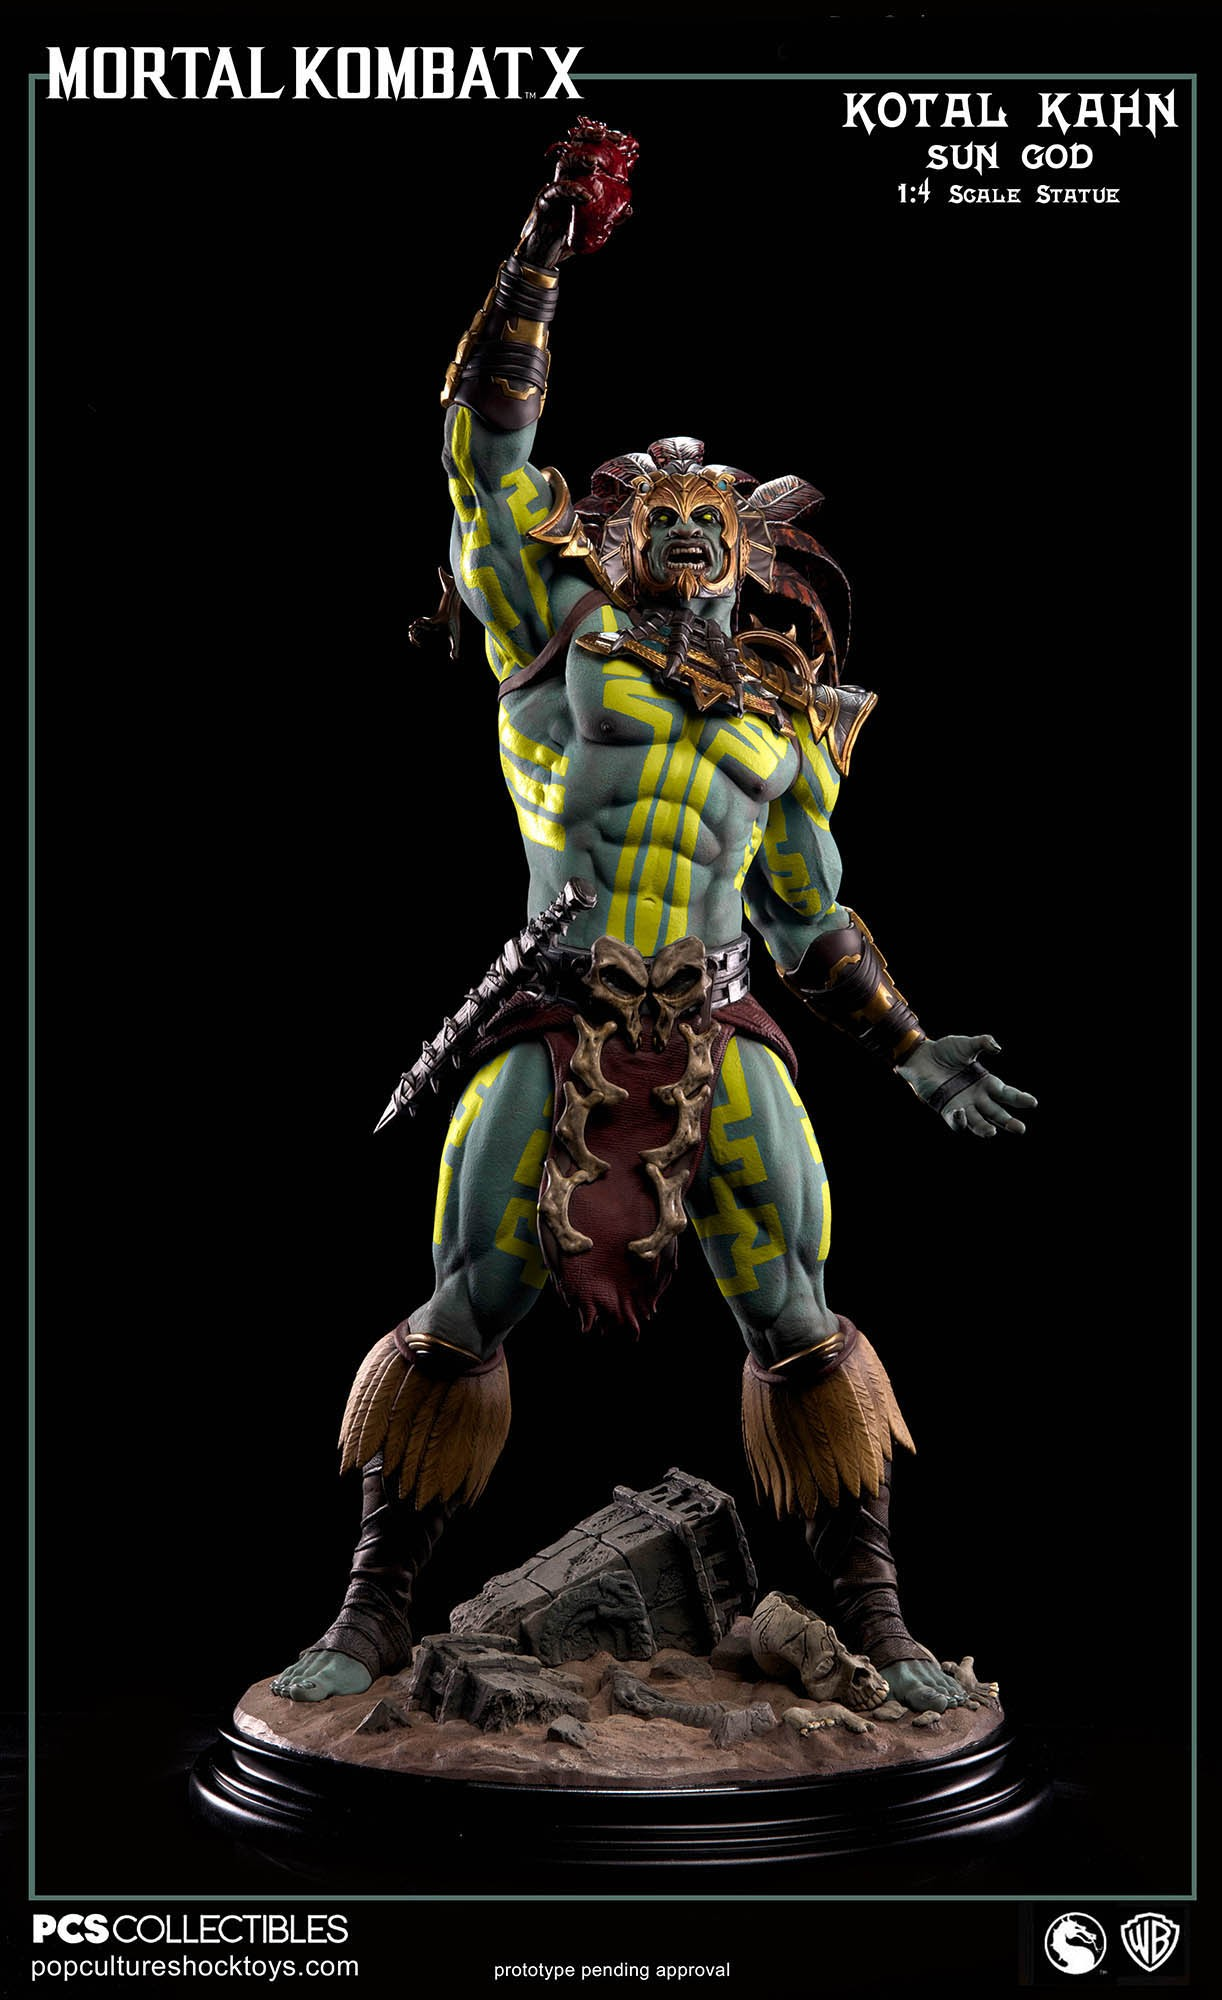 [Pop Culture Shock] Mortal Kombat X: Kotal Kahn 1:4 scale PCS-Kotal-Kahn-Sun-God-003